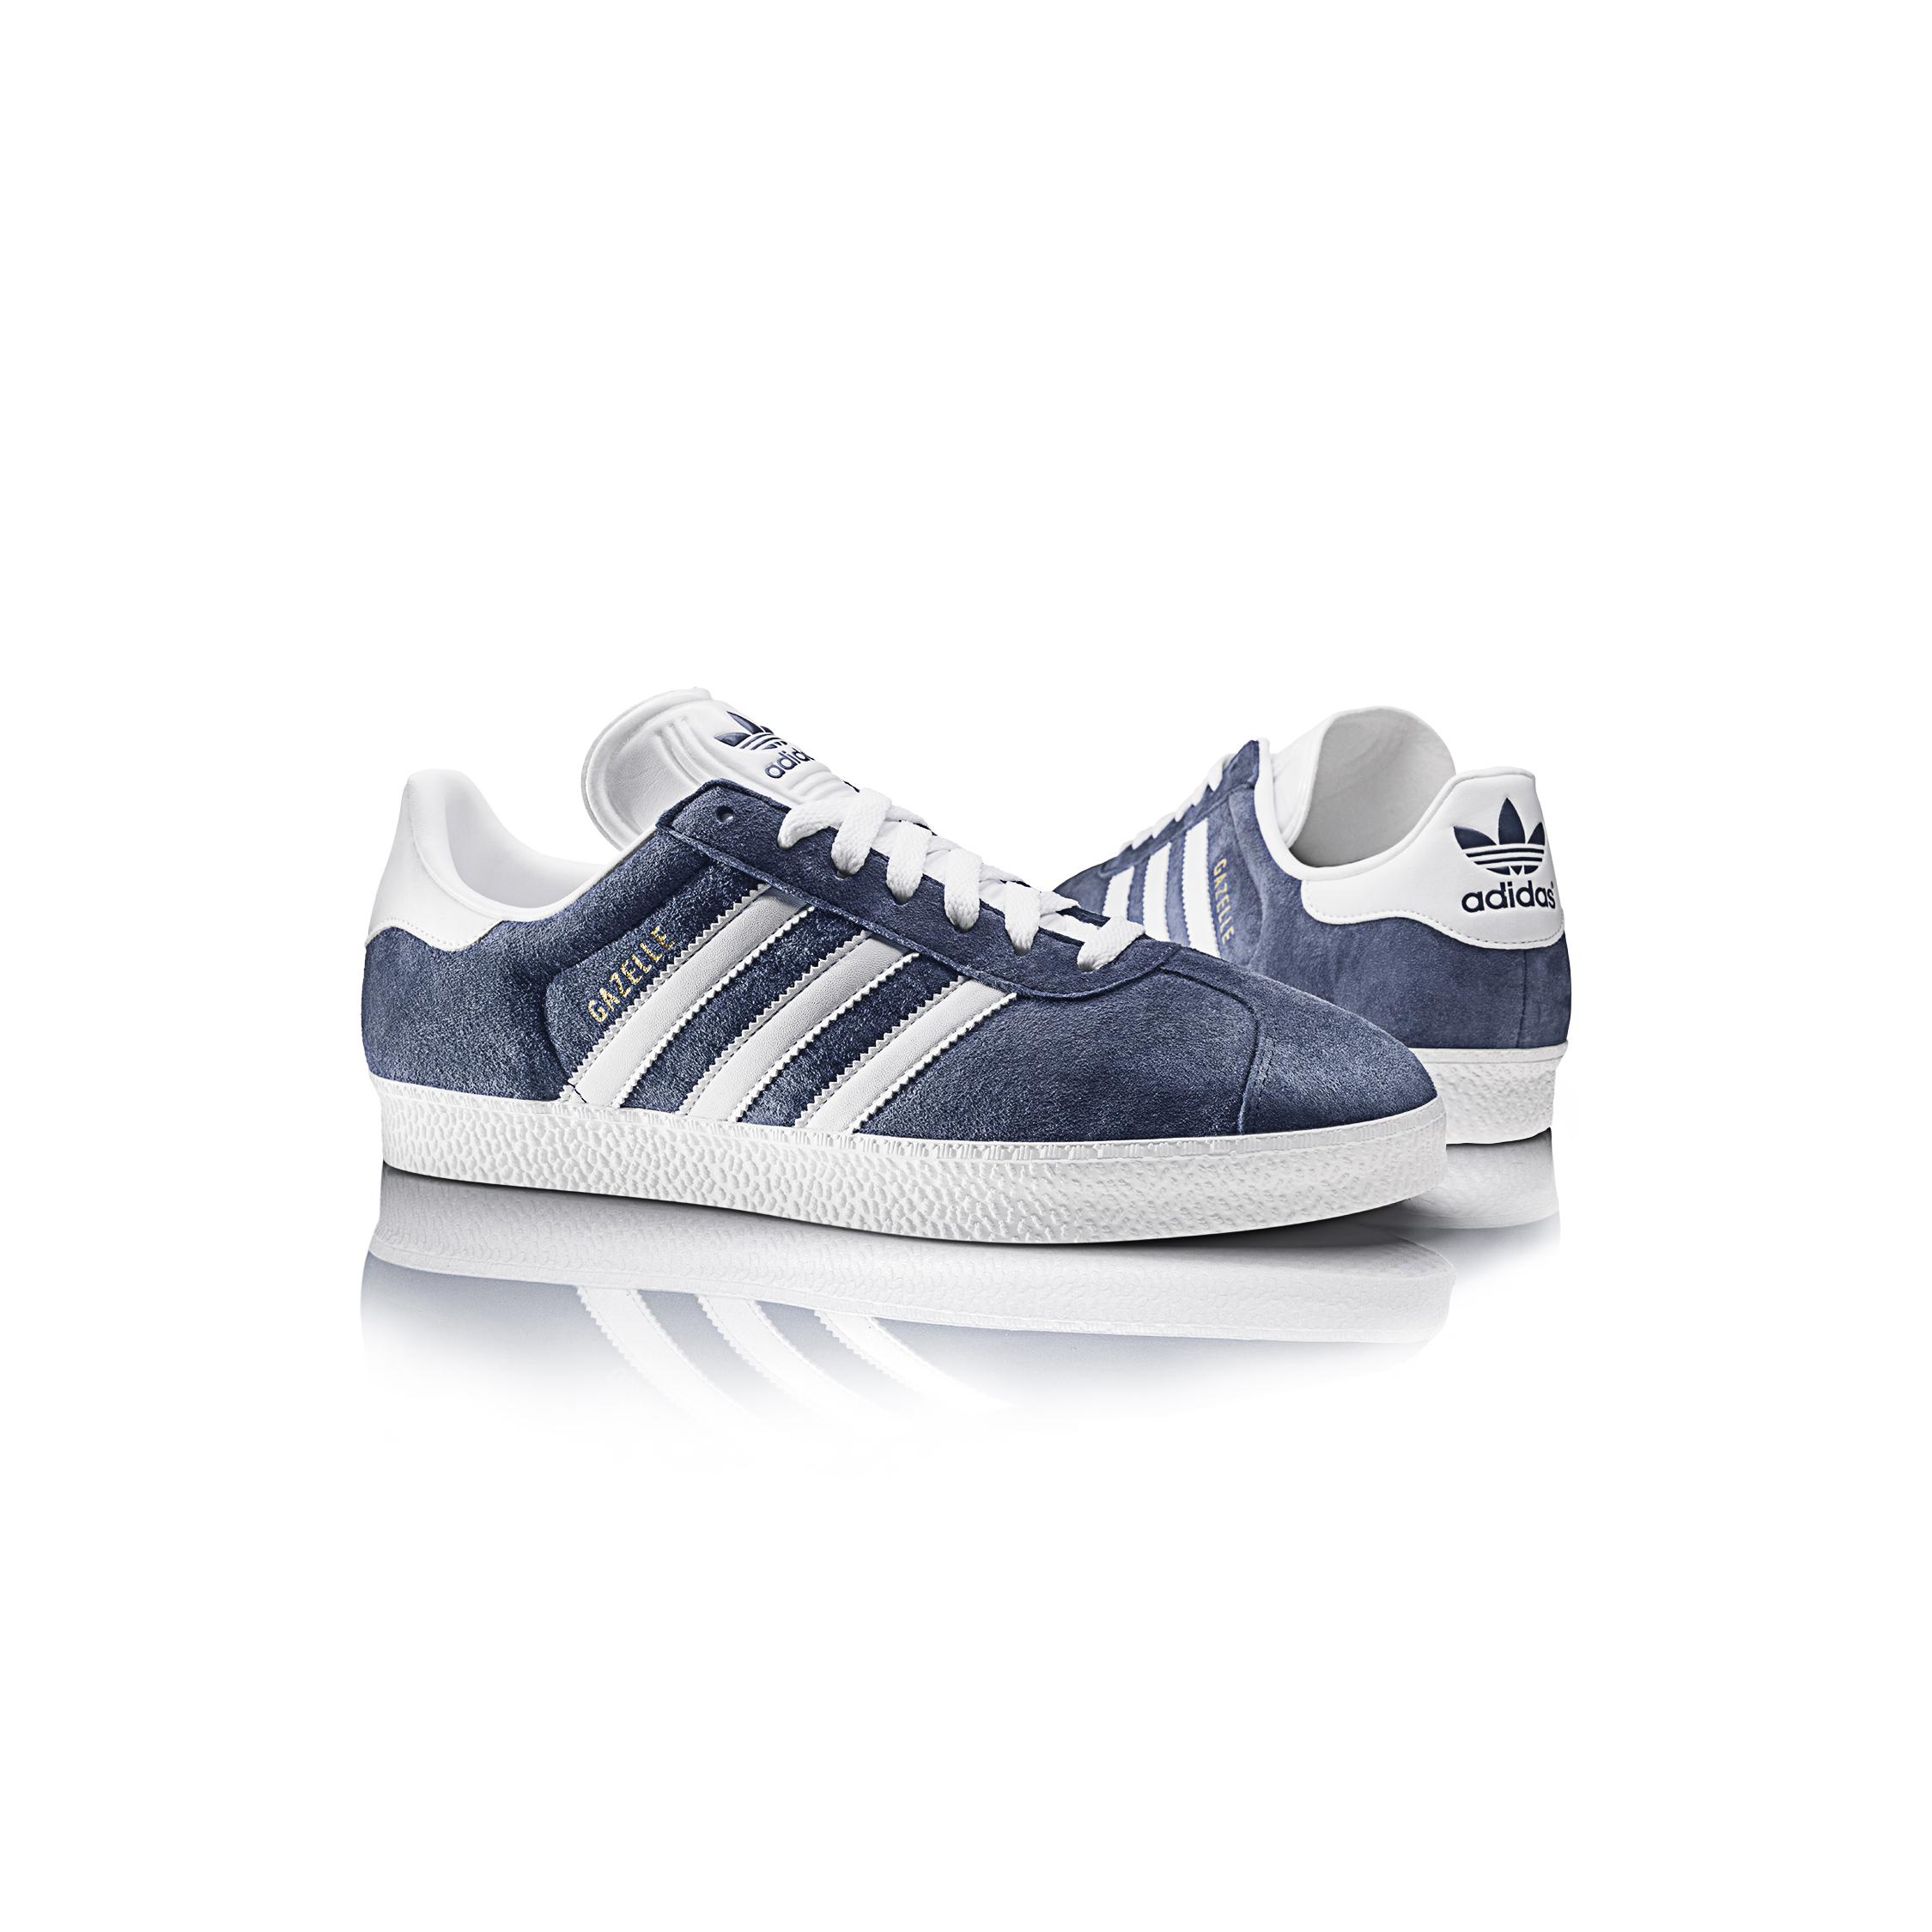 Adidas_Iconics_034581.jpg